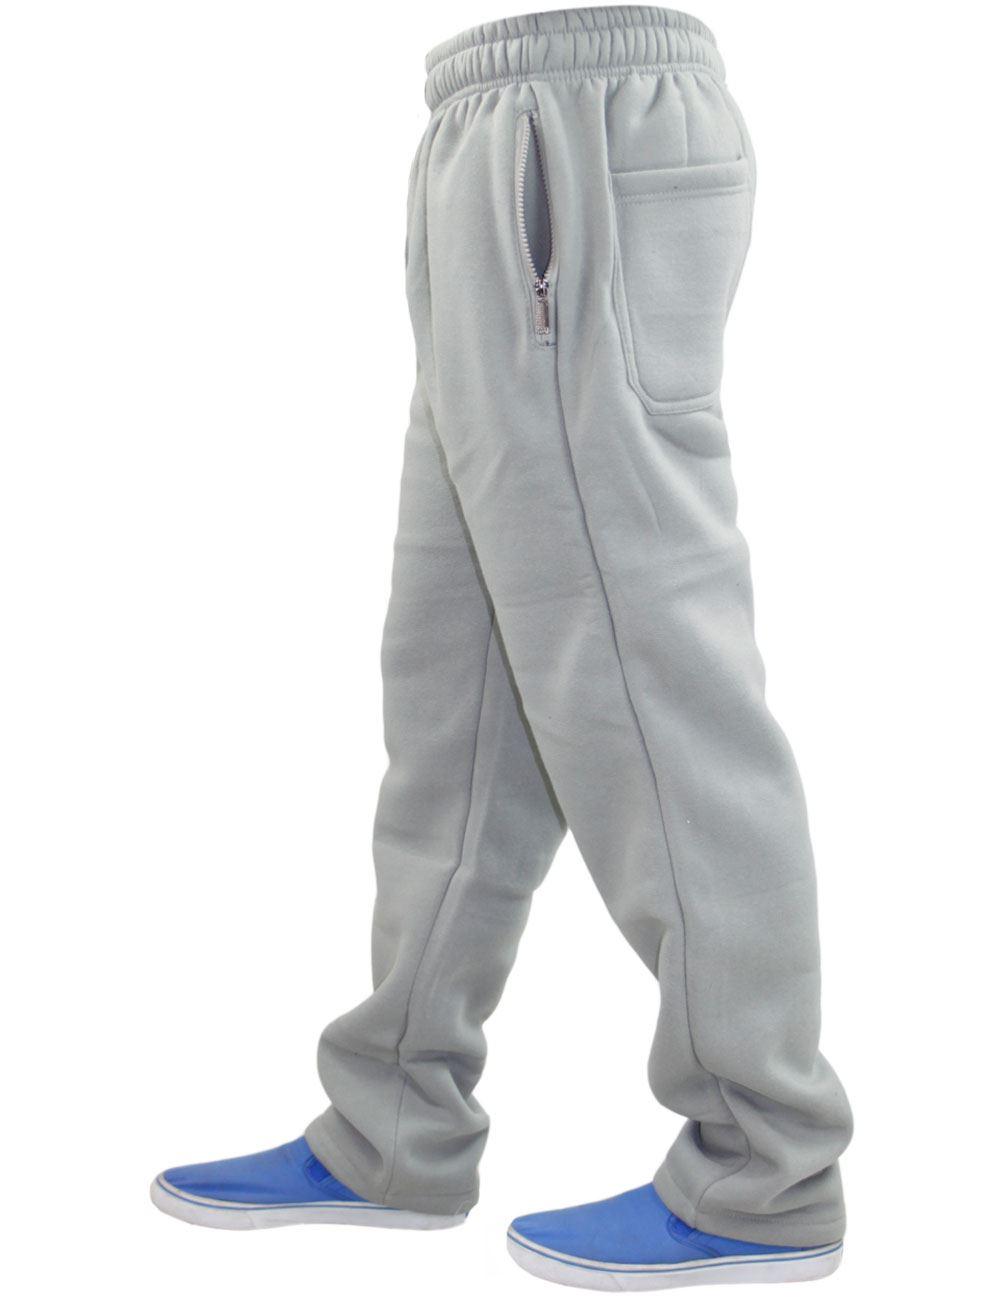 Mens-Women-Plain-Fleece-Joggers-Bottoms-Jogging-Pant-Gym-Fitness-Sports-Trousers thumbnail 33